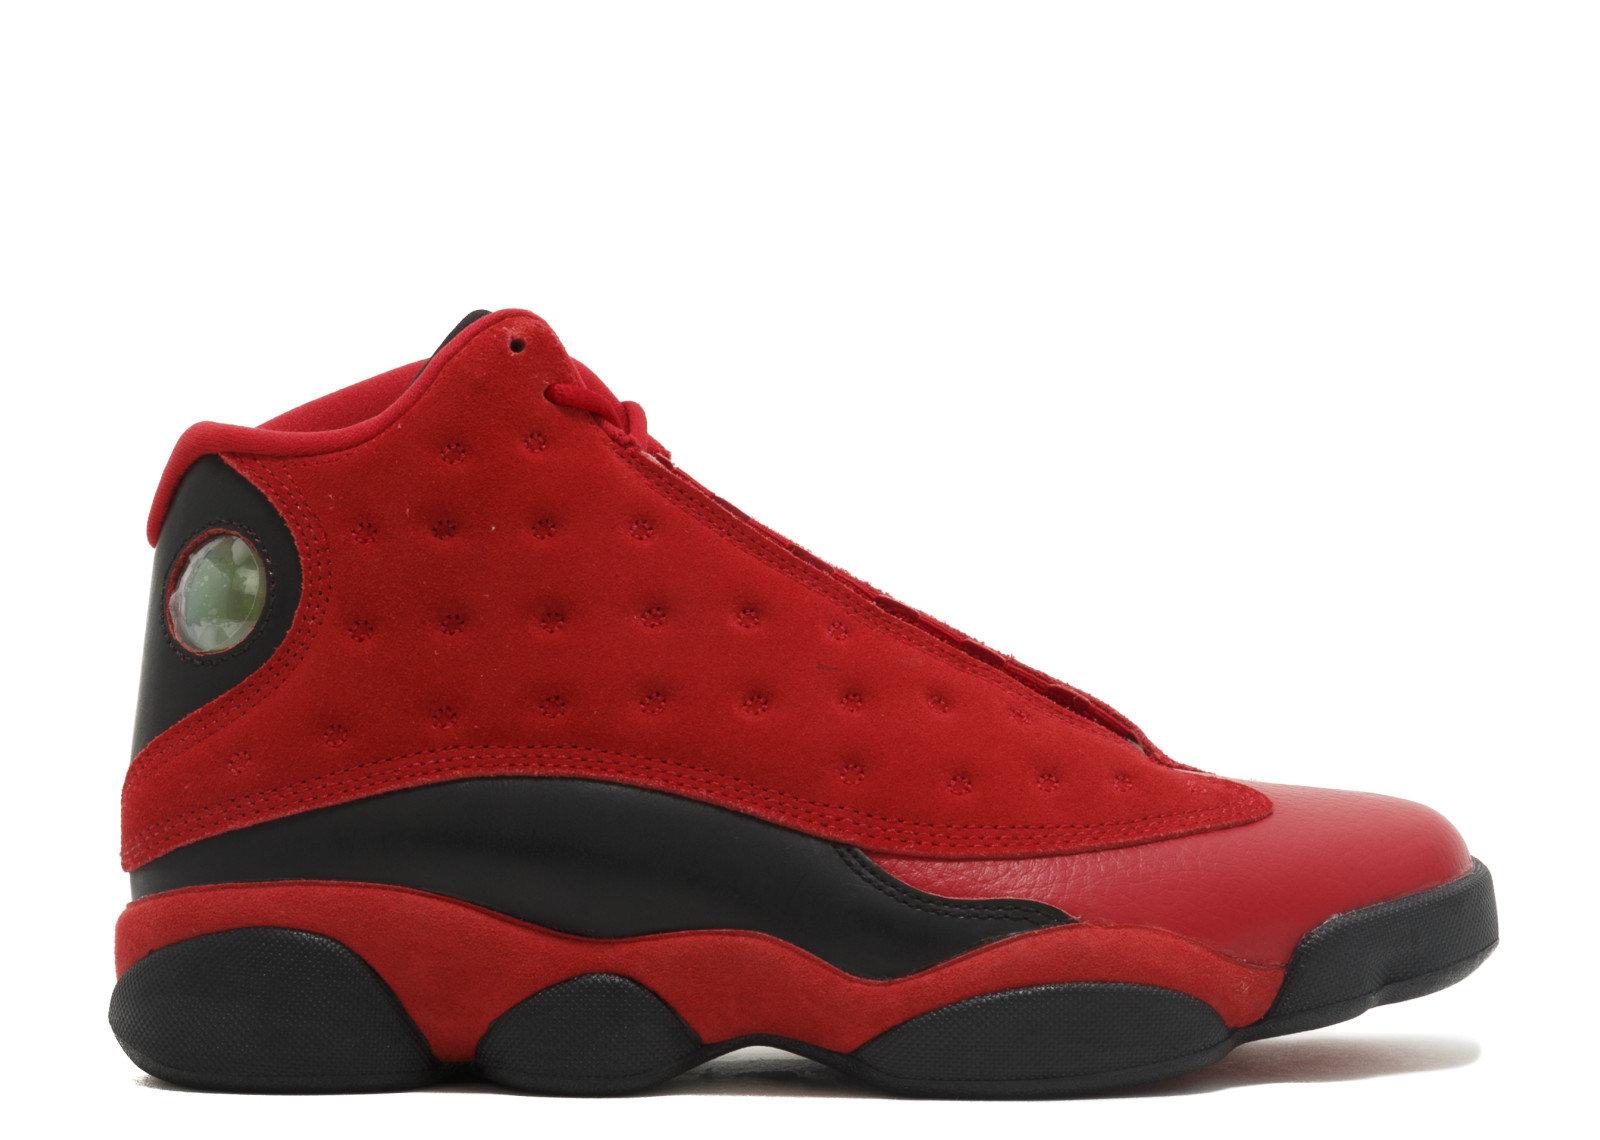 fce223d6a11c Nike Air Jordan Retro 13 Single Day China Exclusive Men